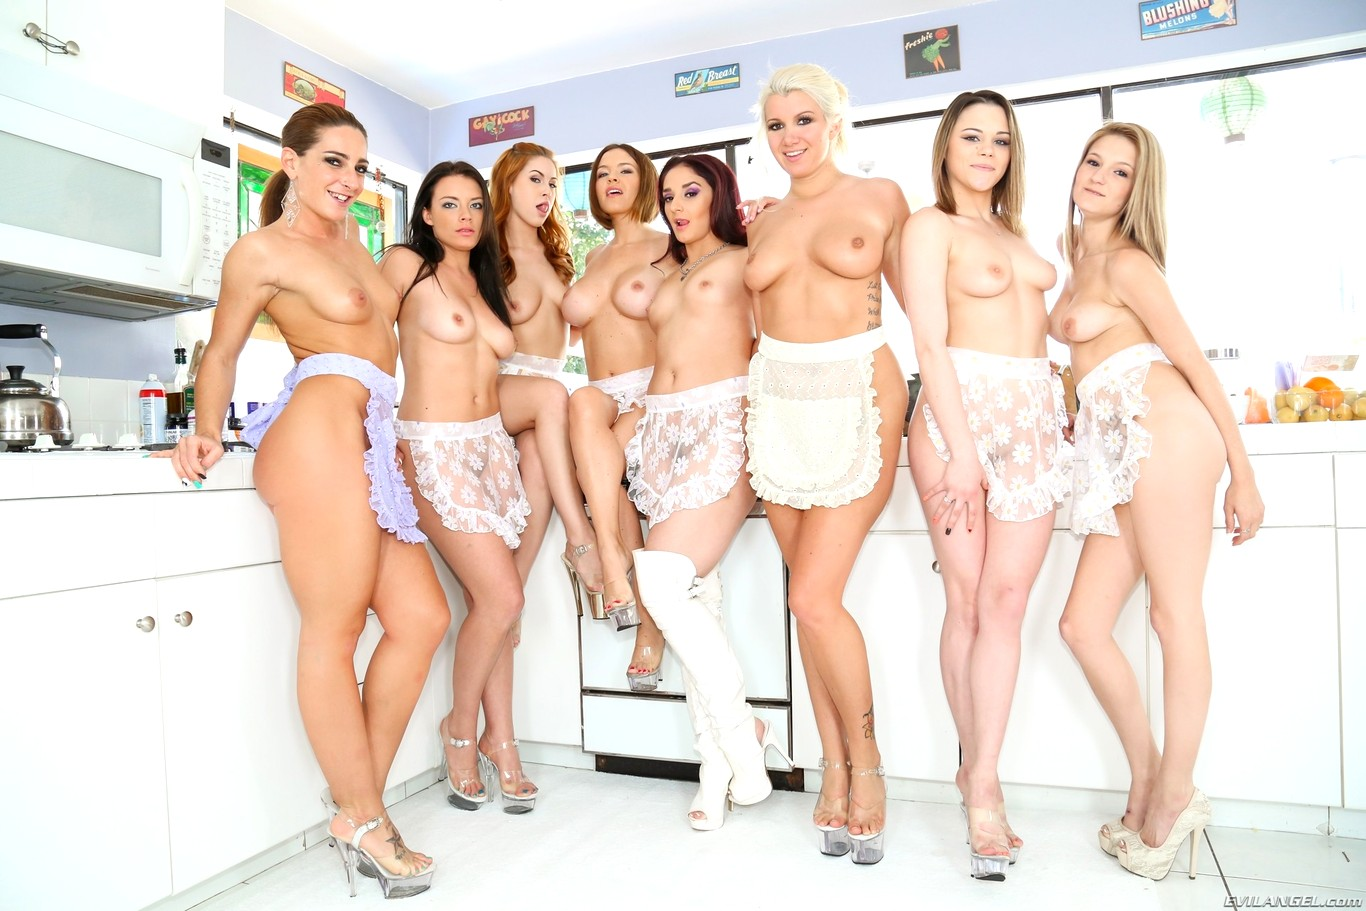 hot sexwork ladies nude